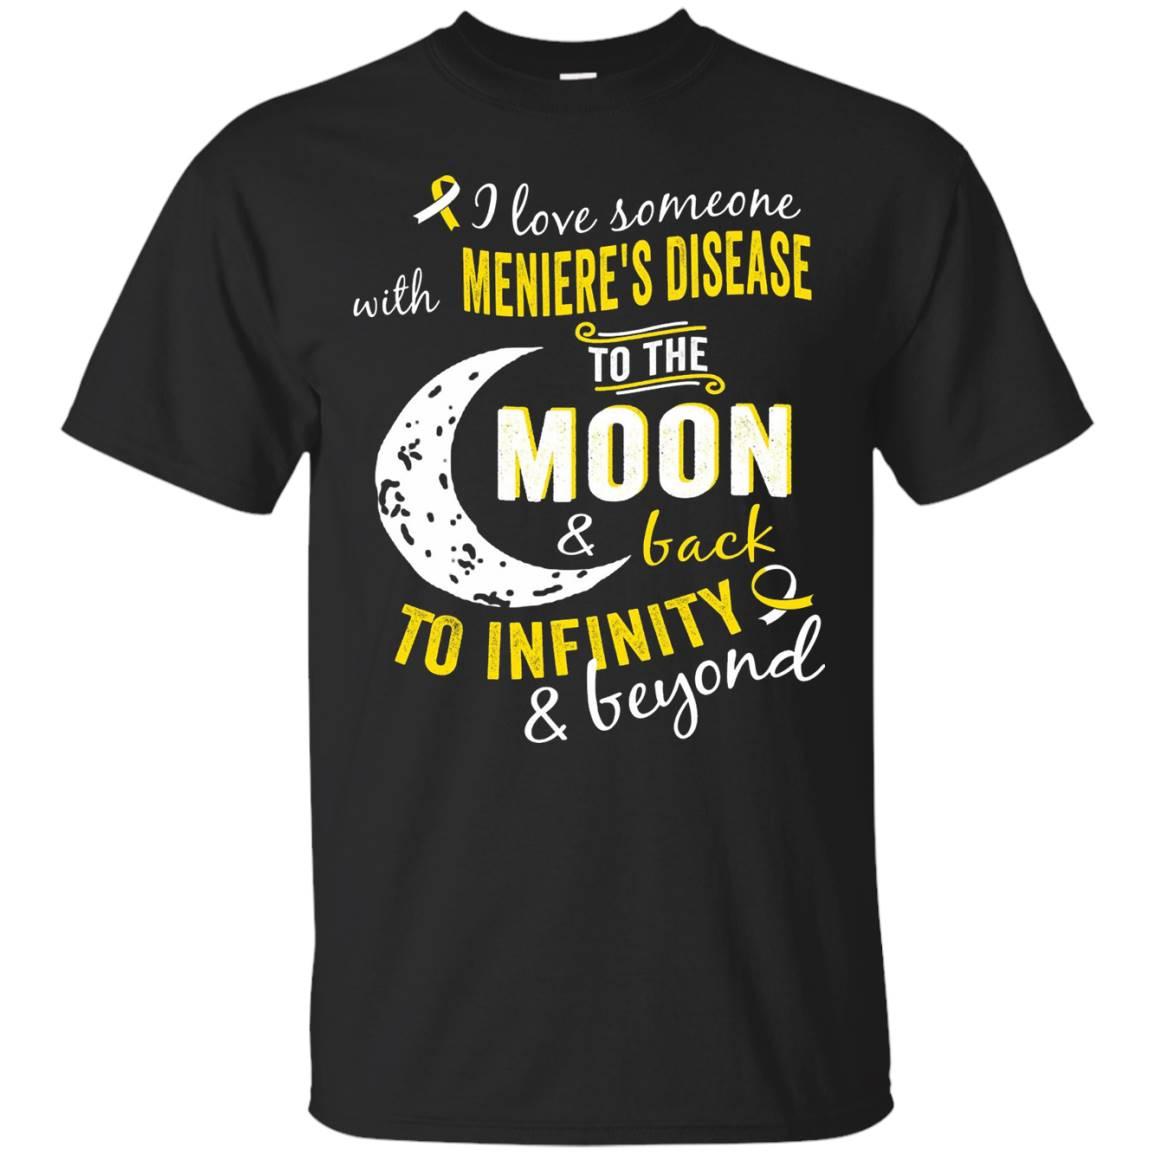 Menieres Disease Shirt – Menieres Disease Awareness Shirt